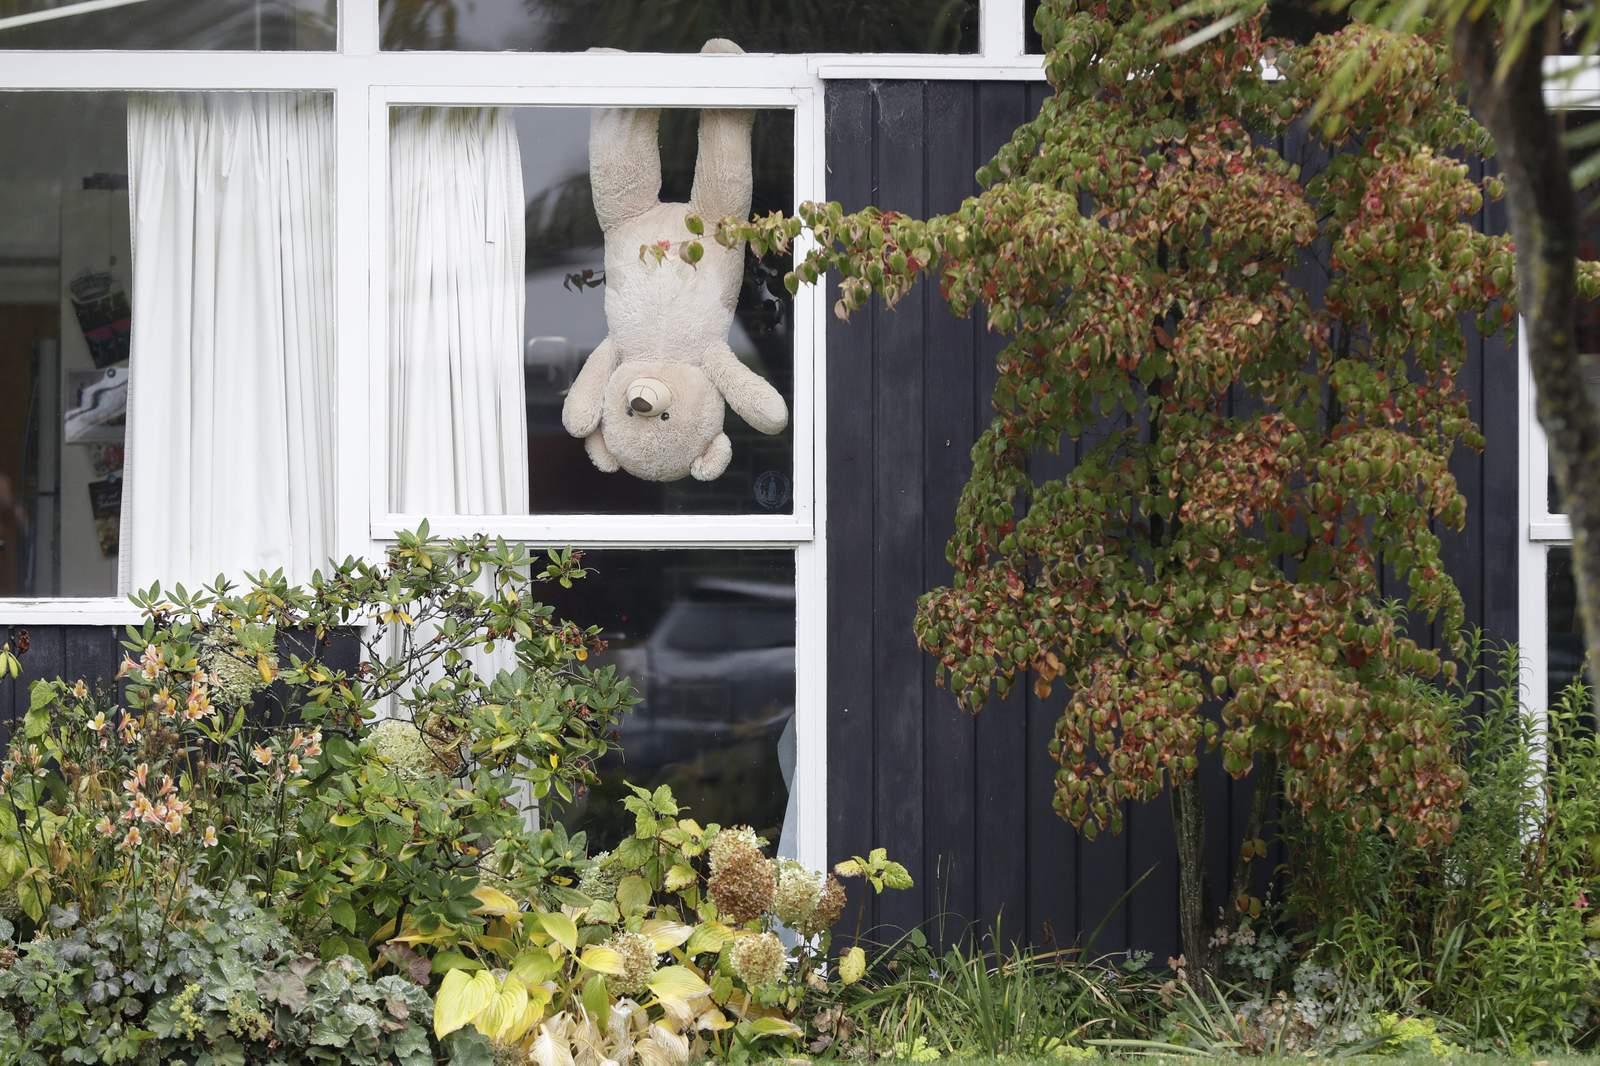 New Zealand embraces teddies to help make lockdown...